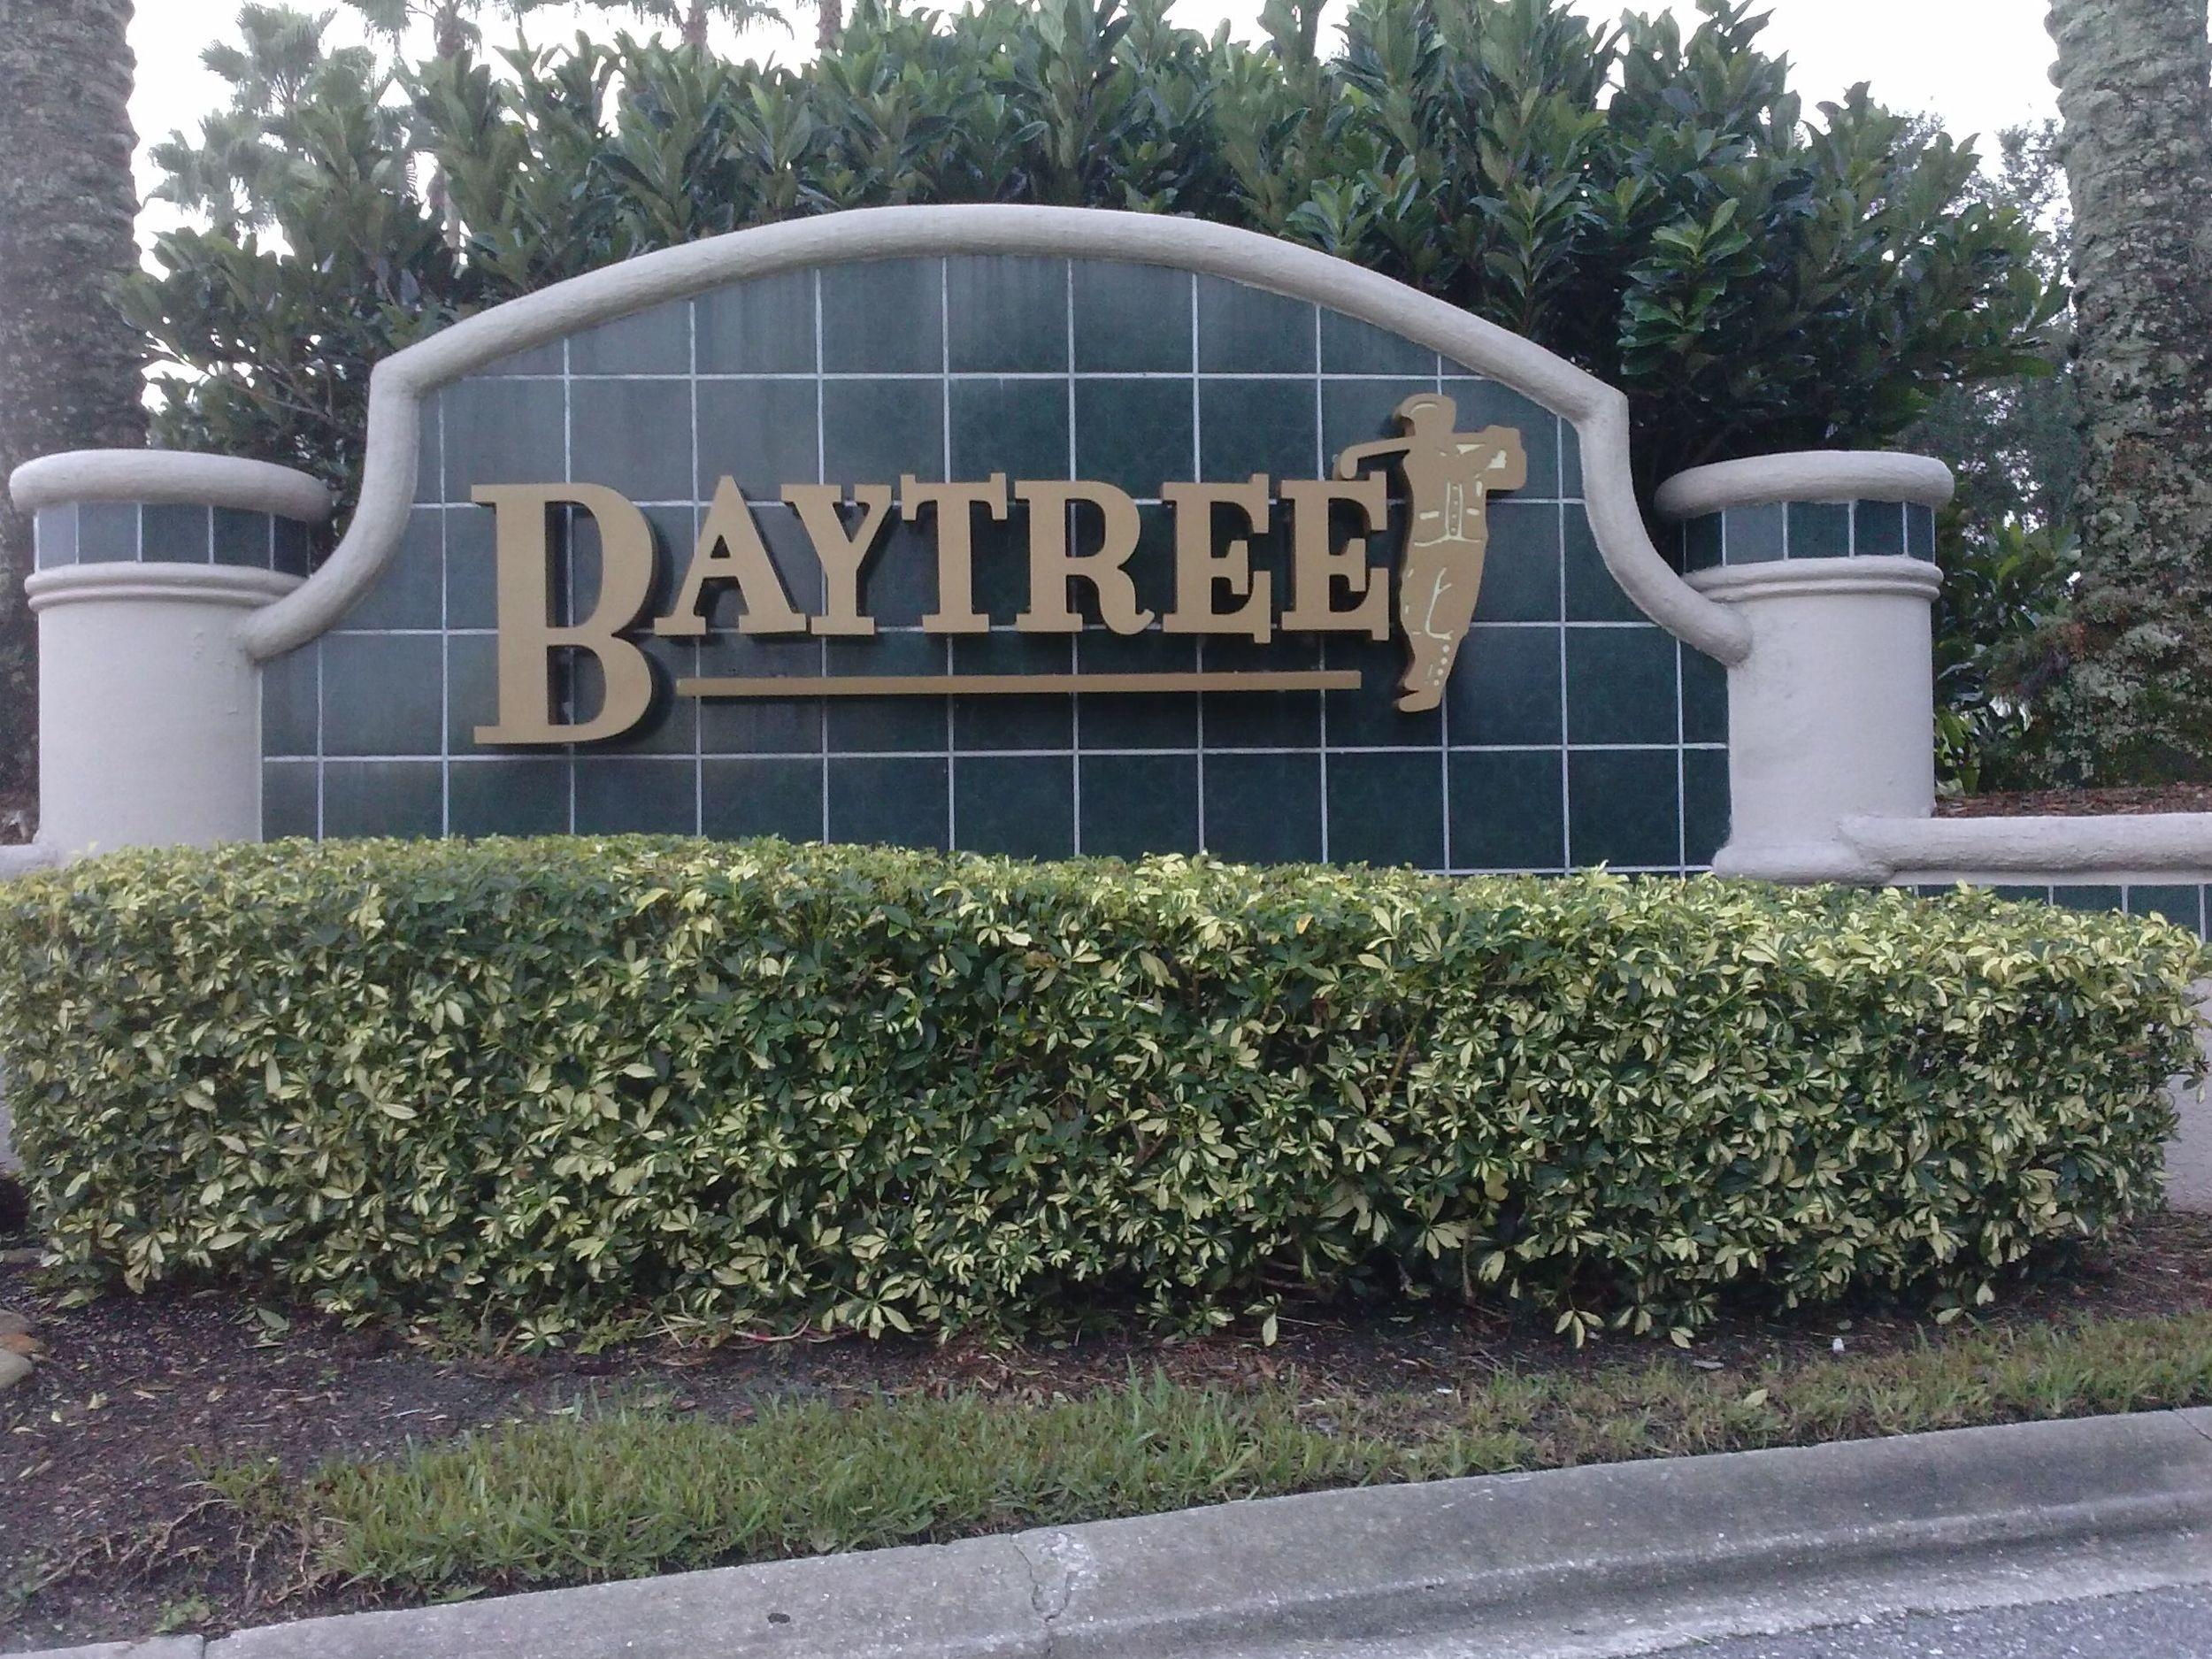 entrance to baytree:suntree.jpg